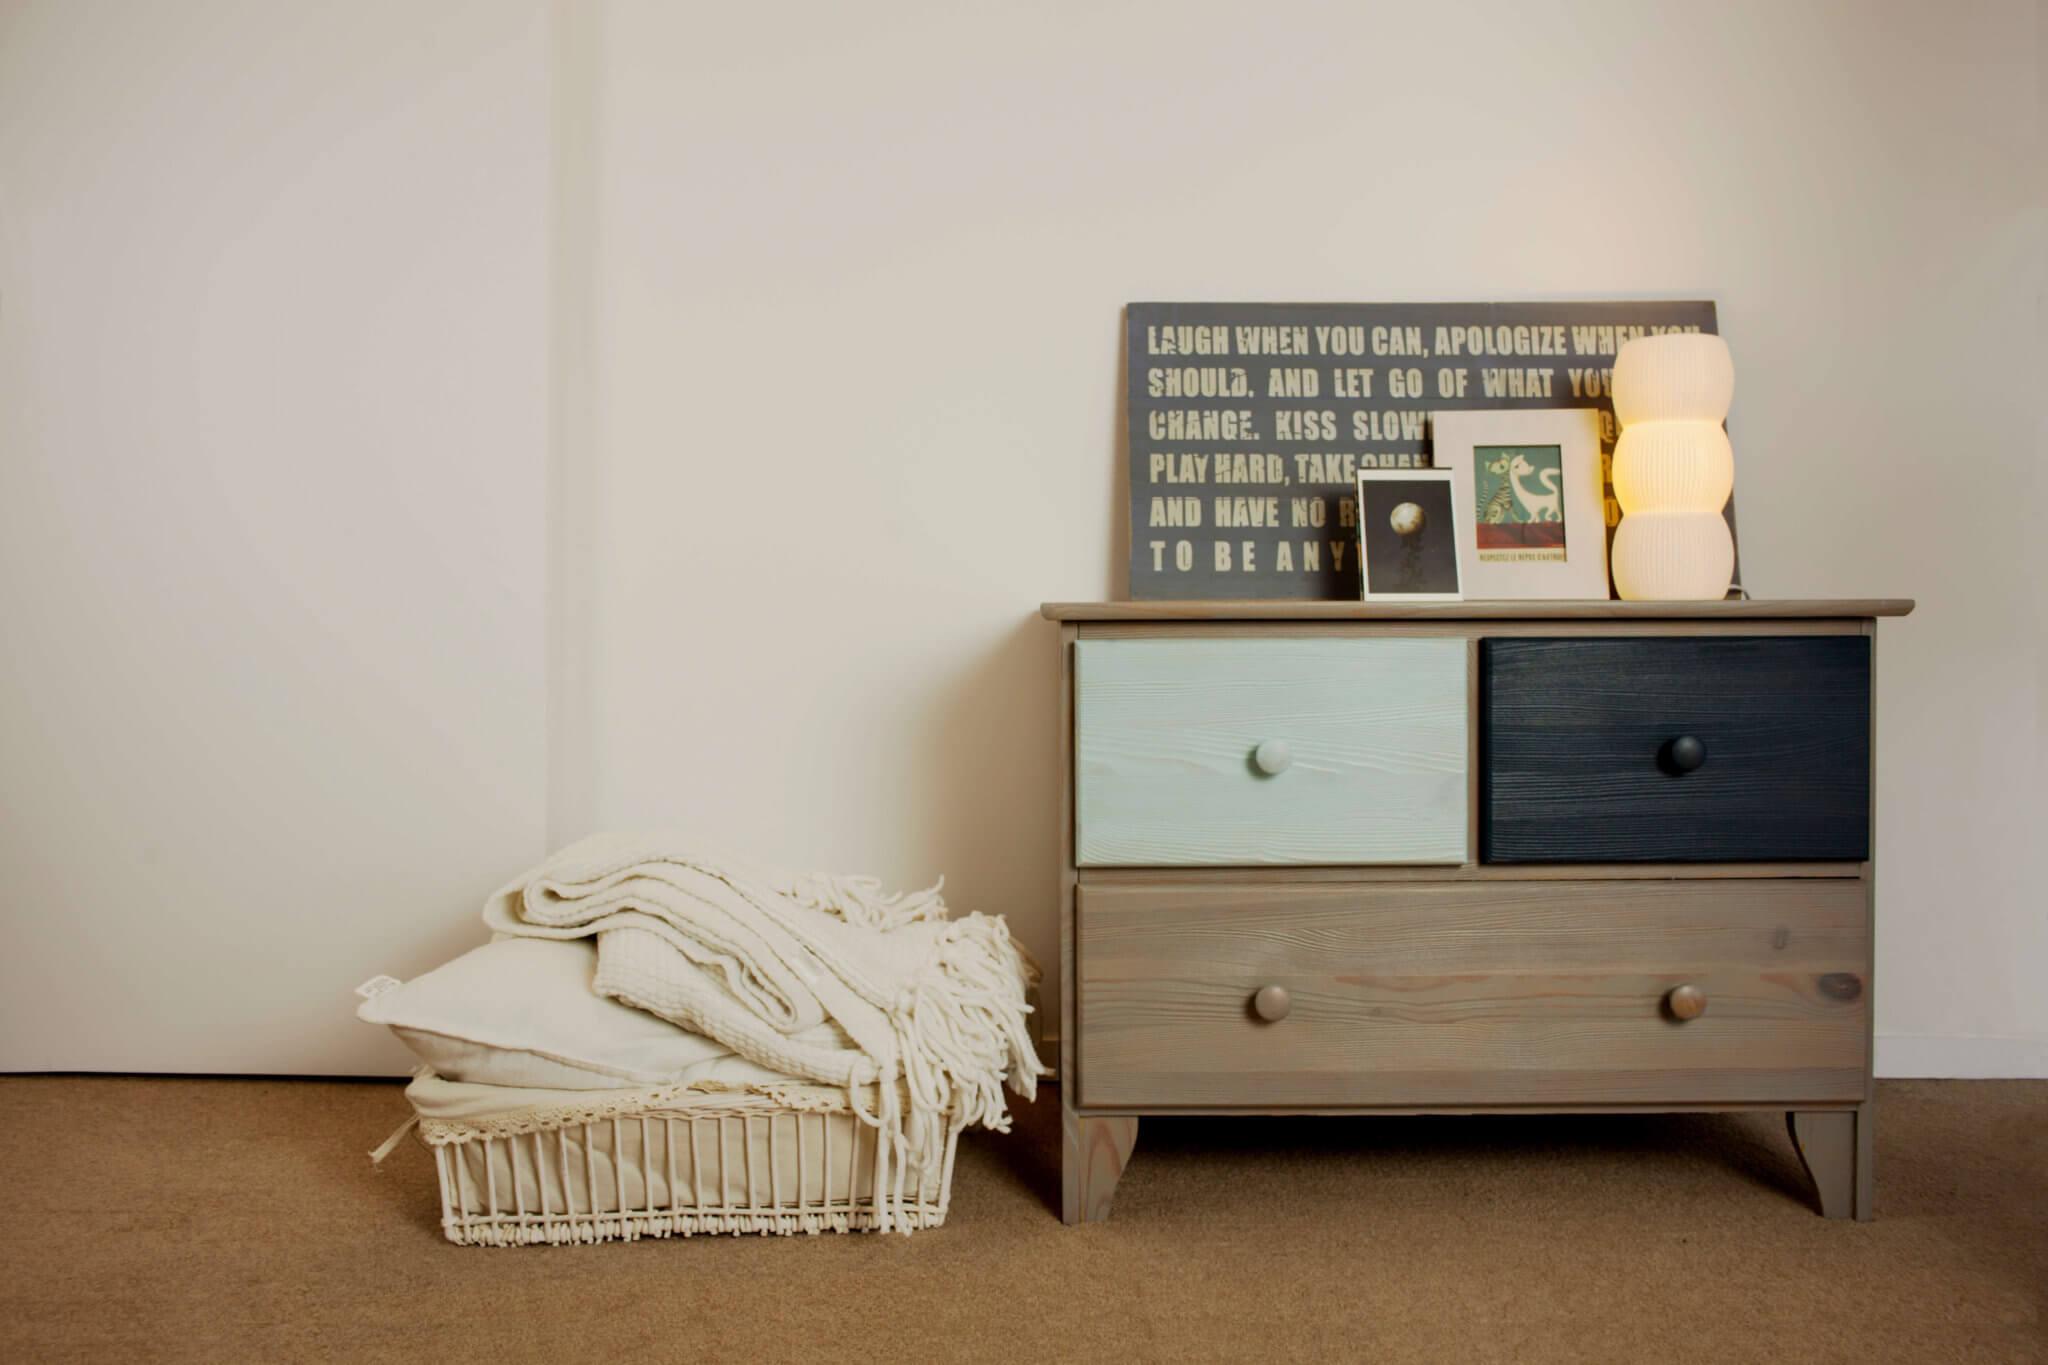 Comment nettoyer le teck restaurer les couleurs d for Nettoyer meuble teck